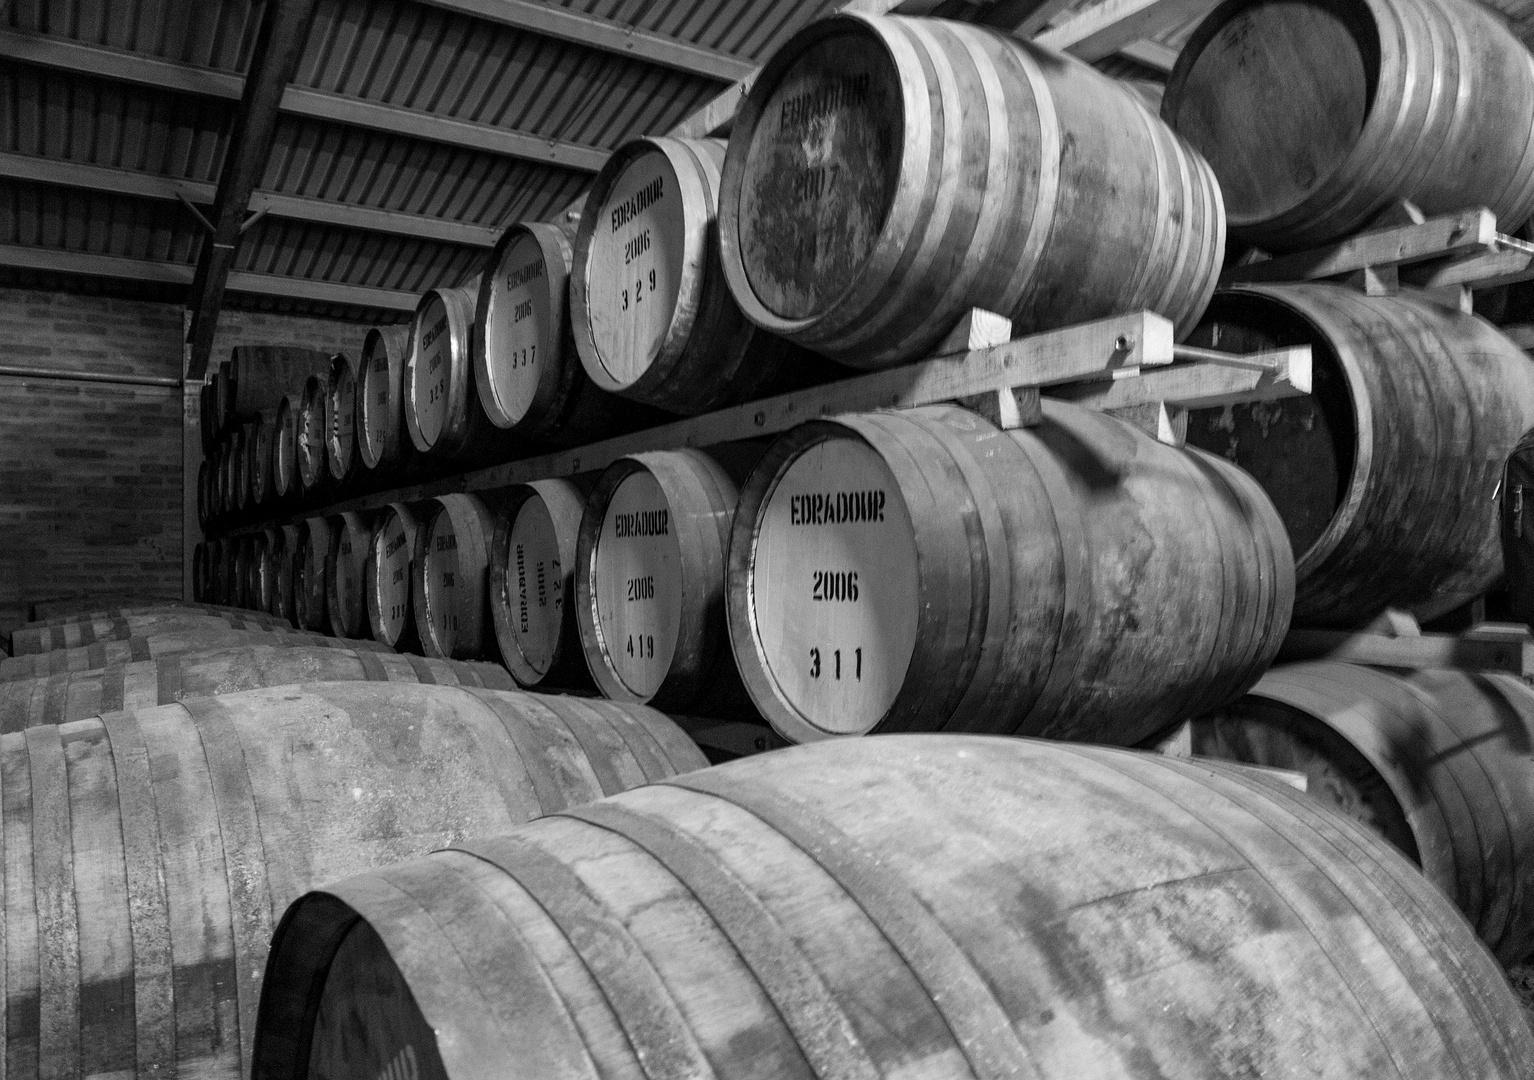 Finest single malt scotch whisky II